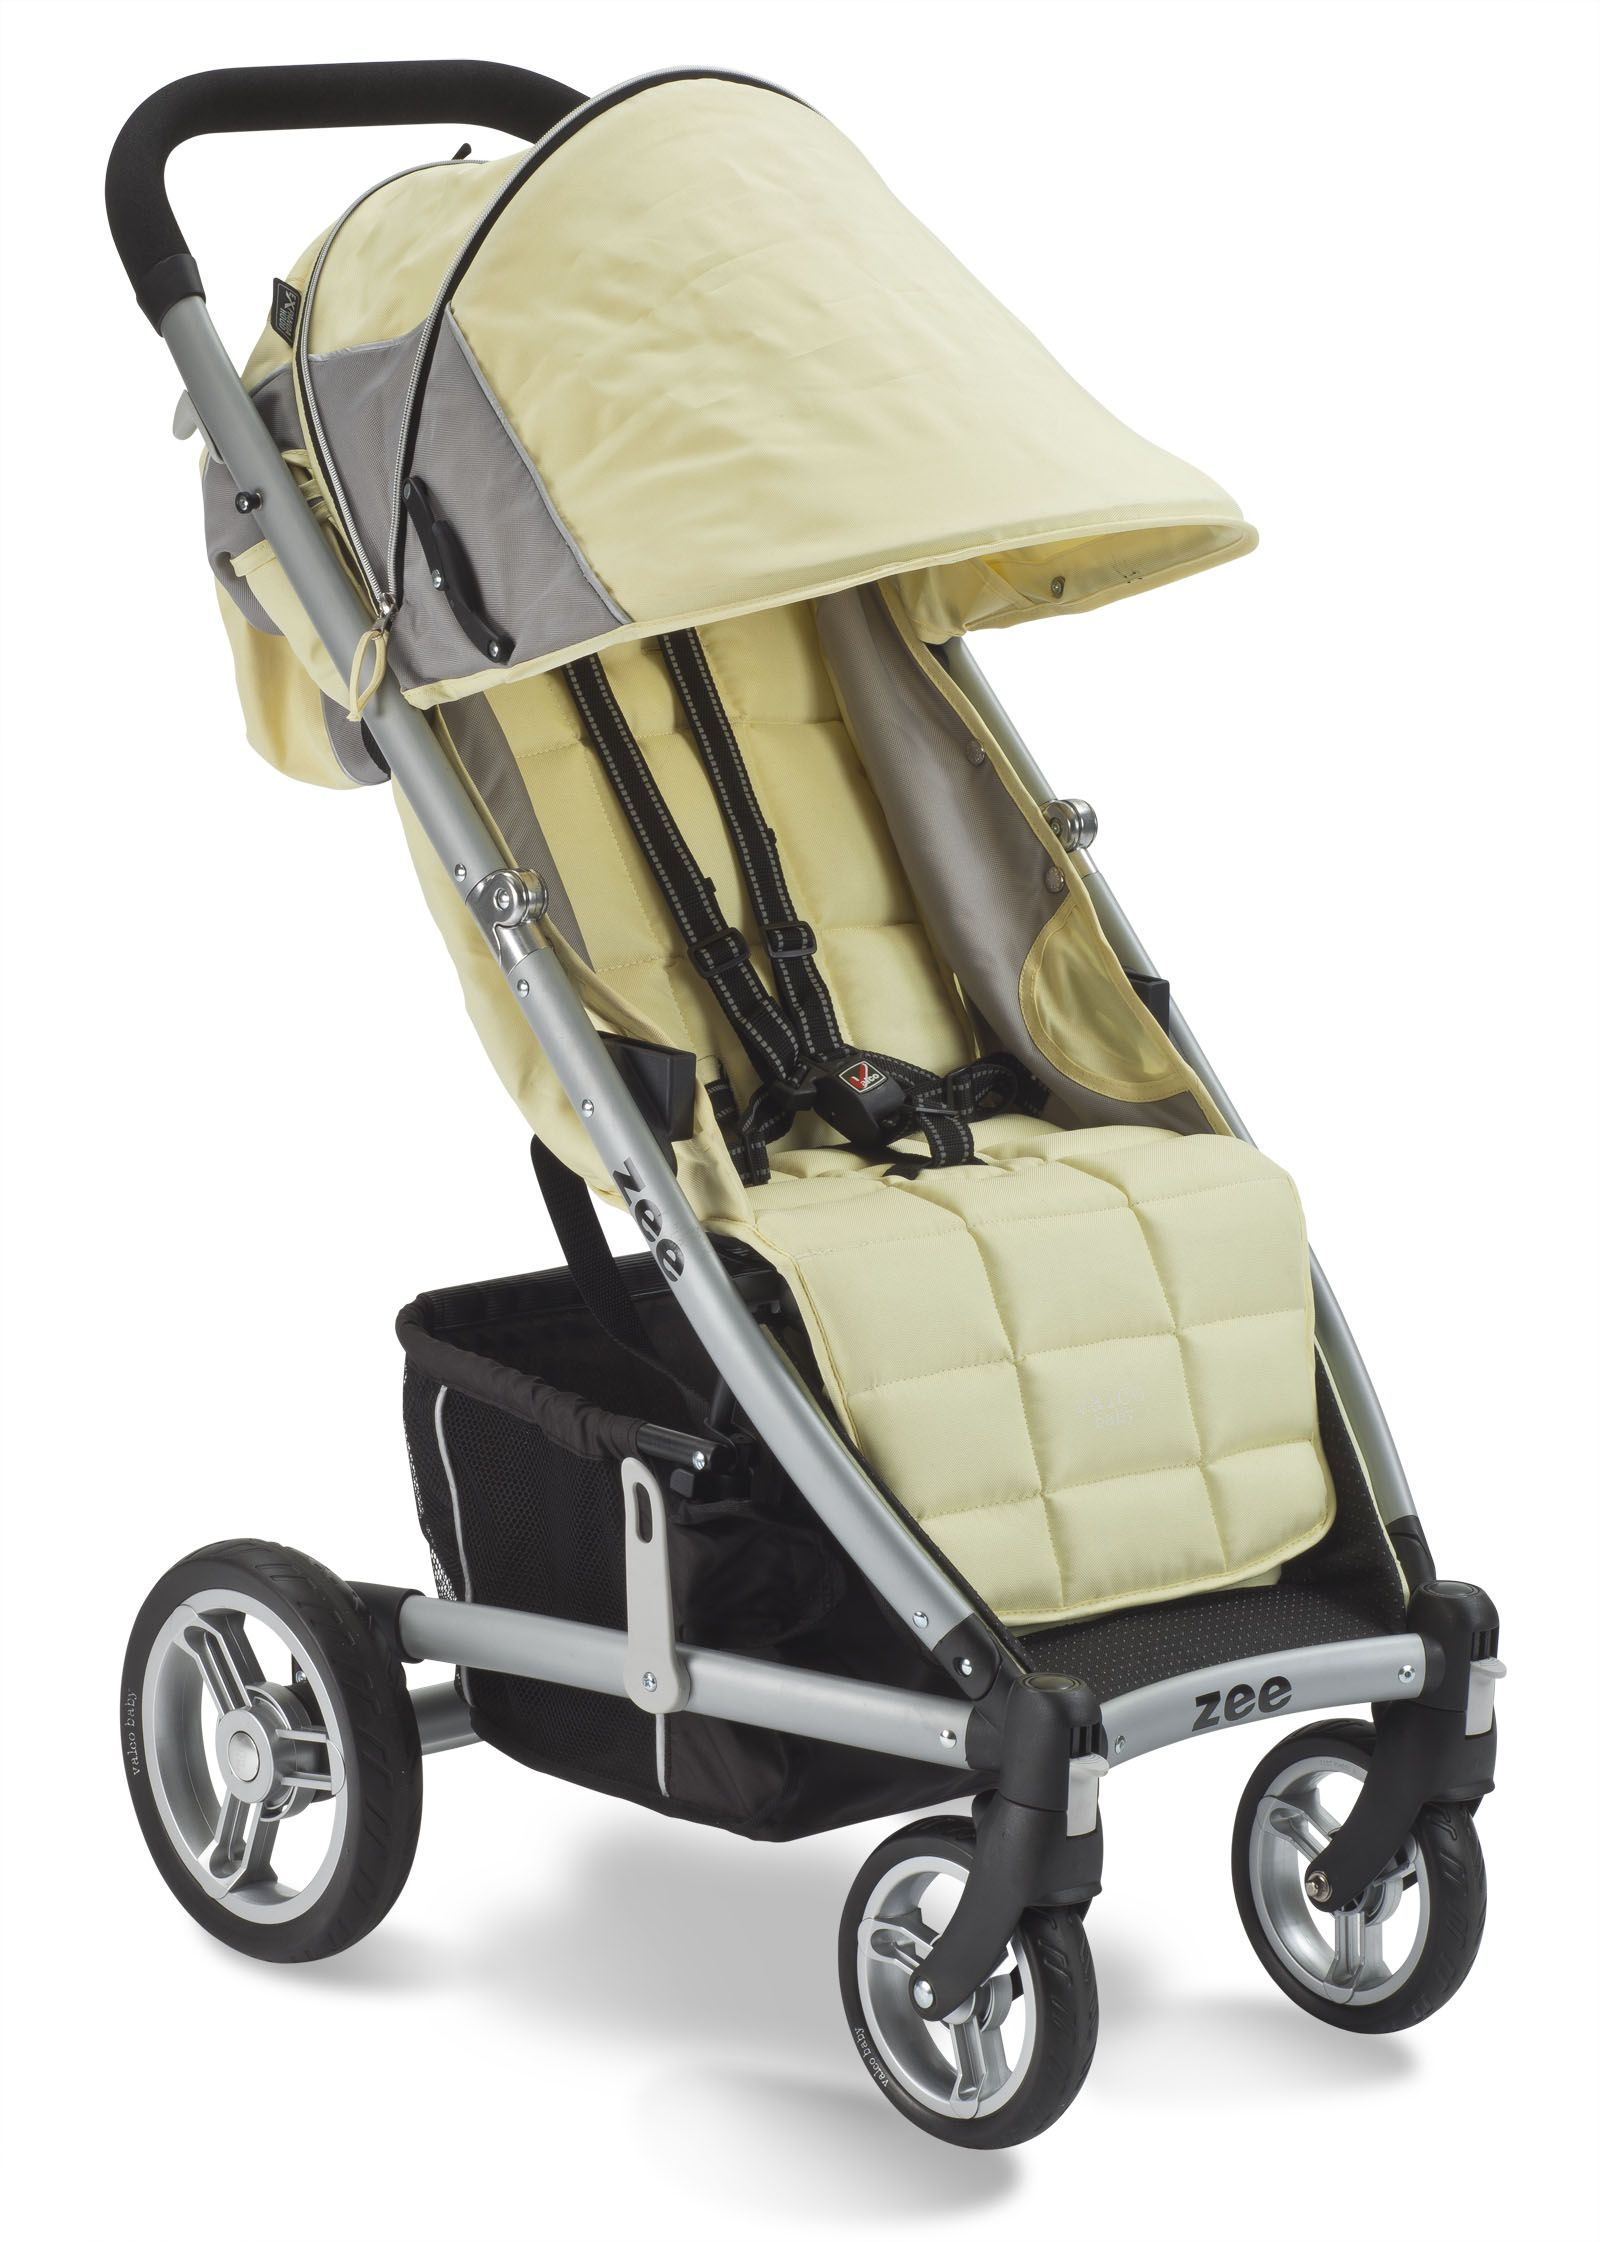 Citrine Zee (With images) Single stroller, Stroller